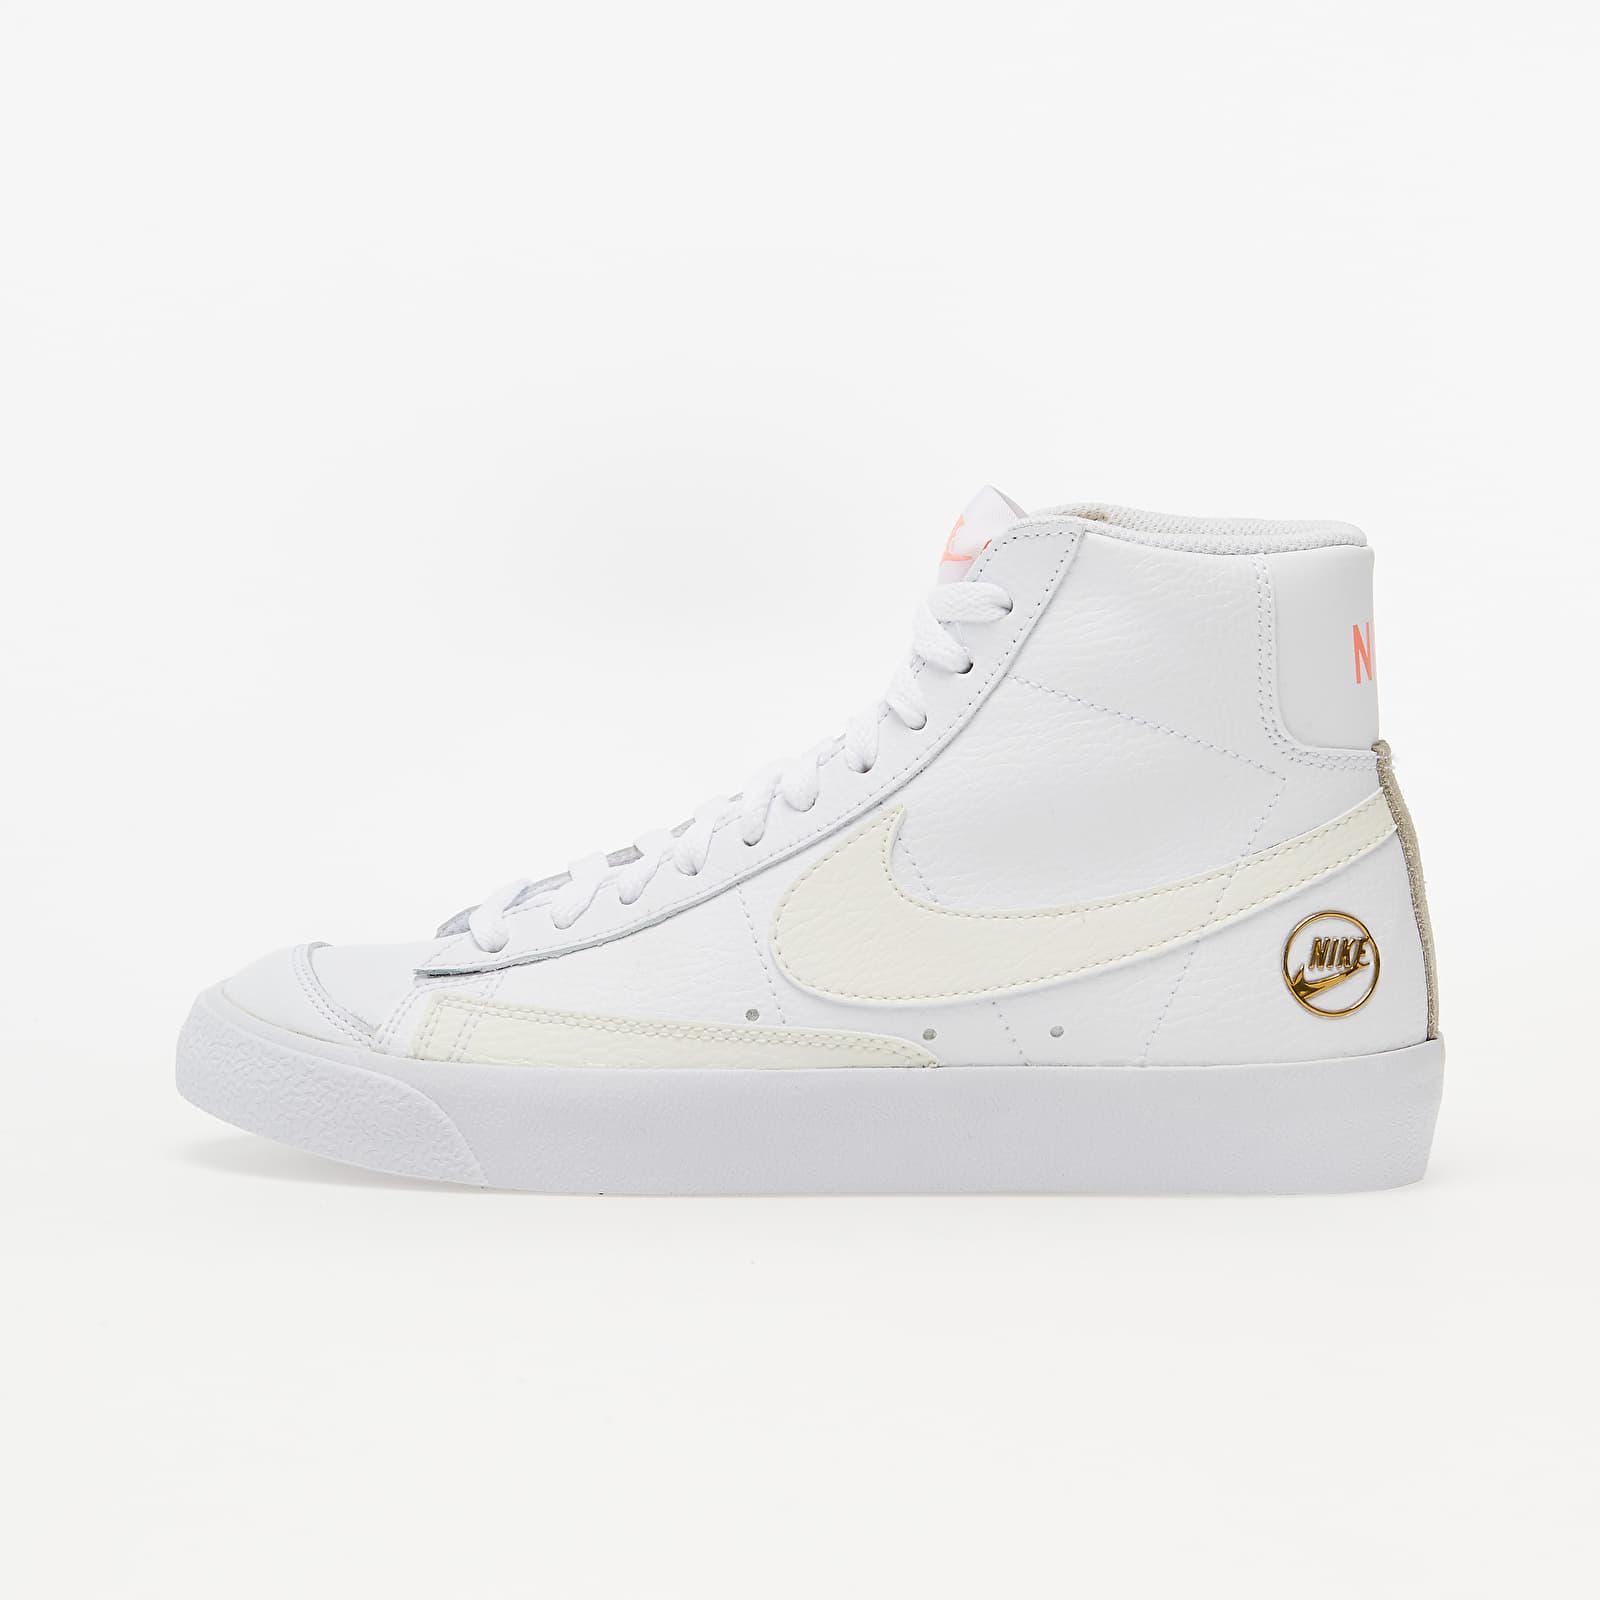 Chaussures et baskets femme Nike W Blazer Mid Vintage '77 White/ Sail-Metallic Gold-Atomic Pink